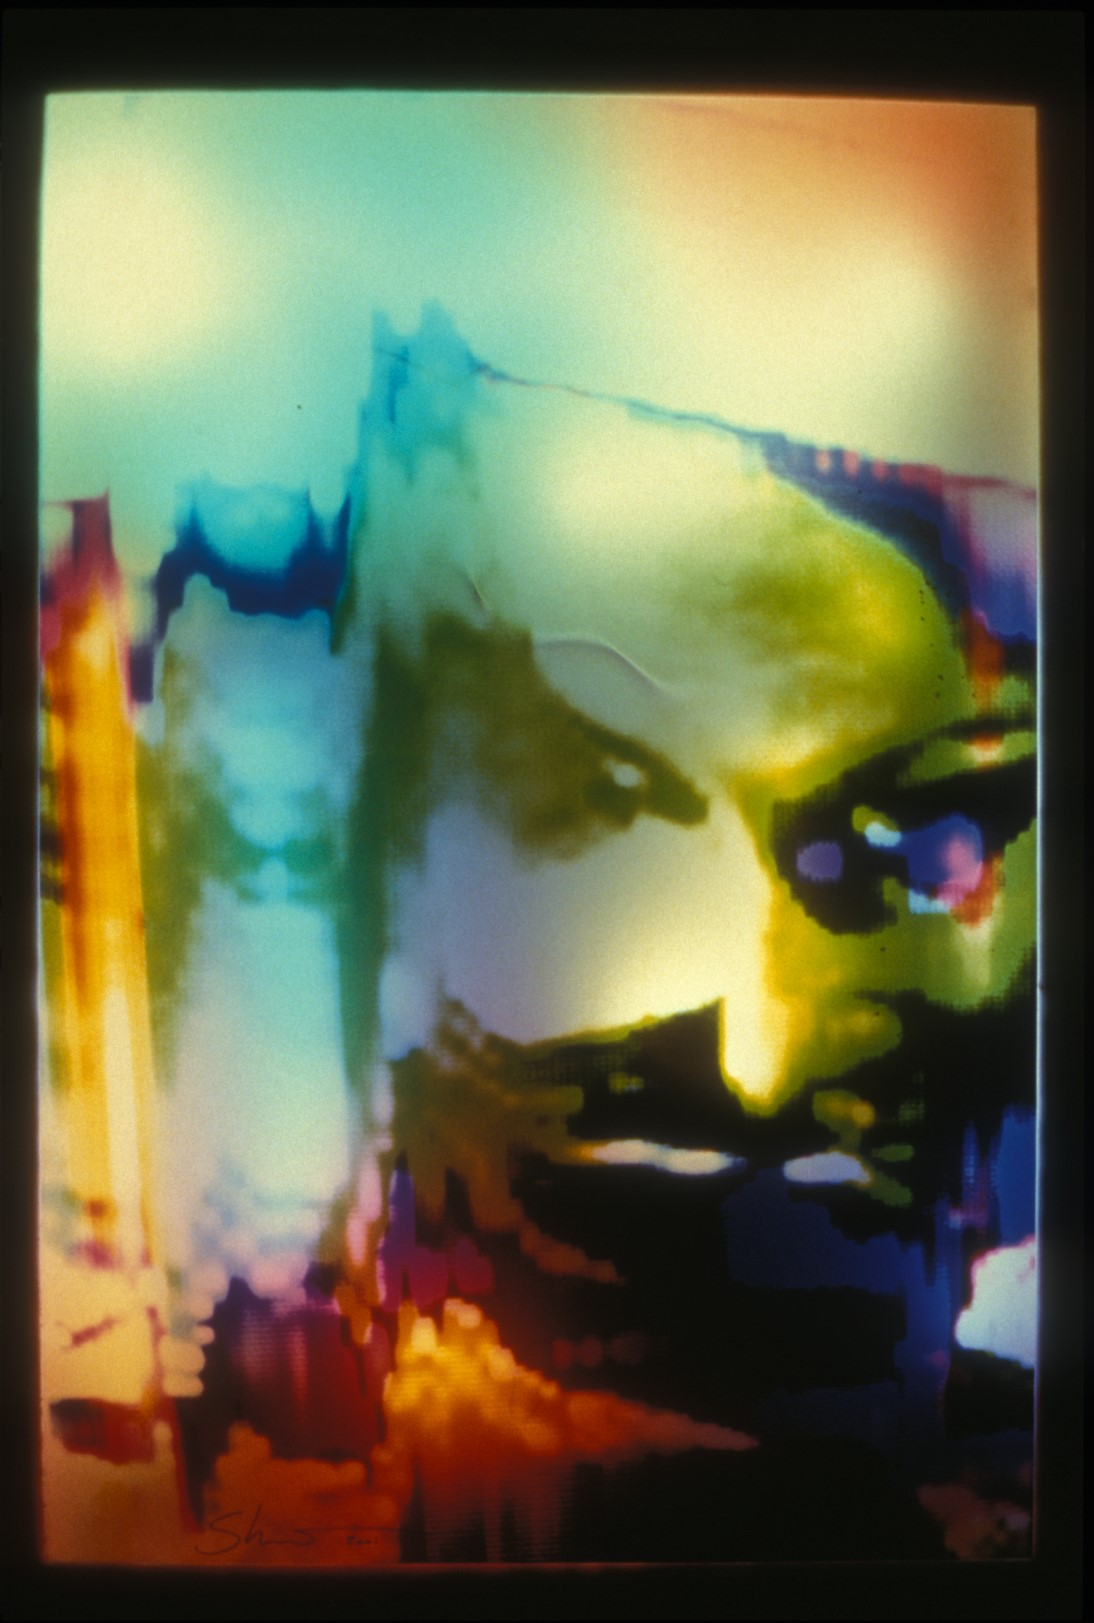 Illuminata Series: Altered Vision